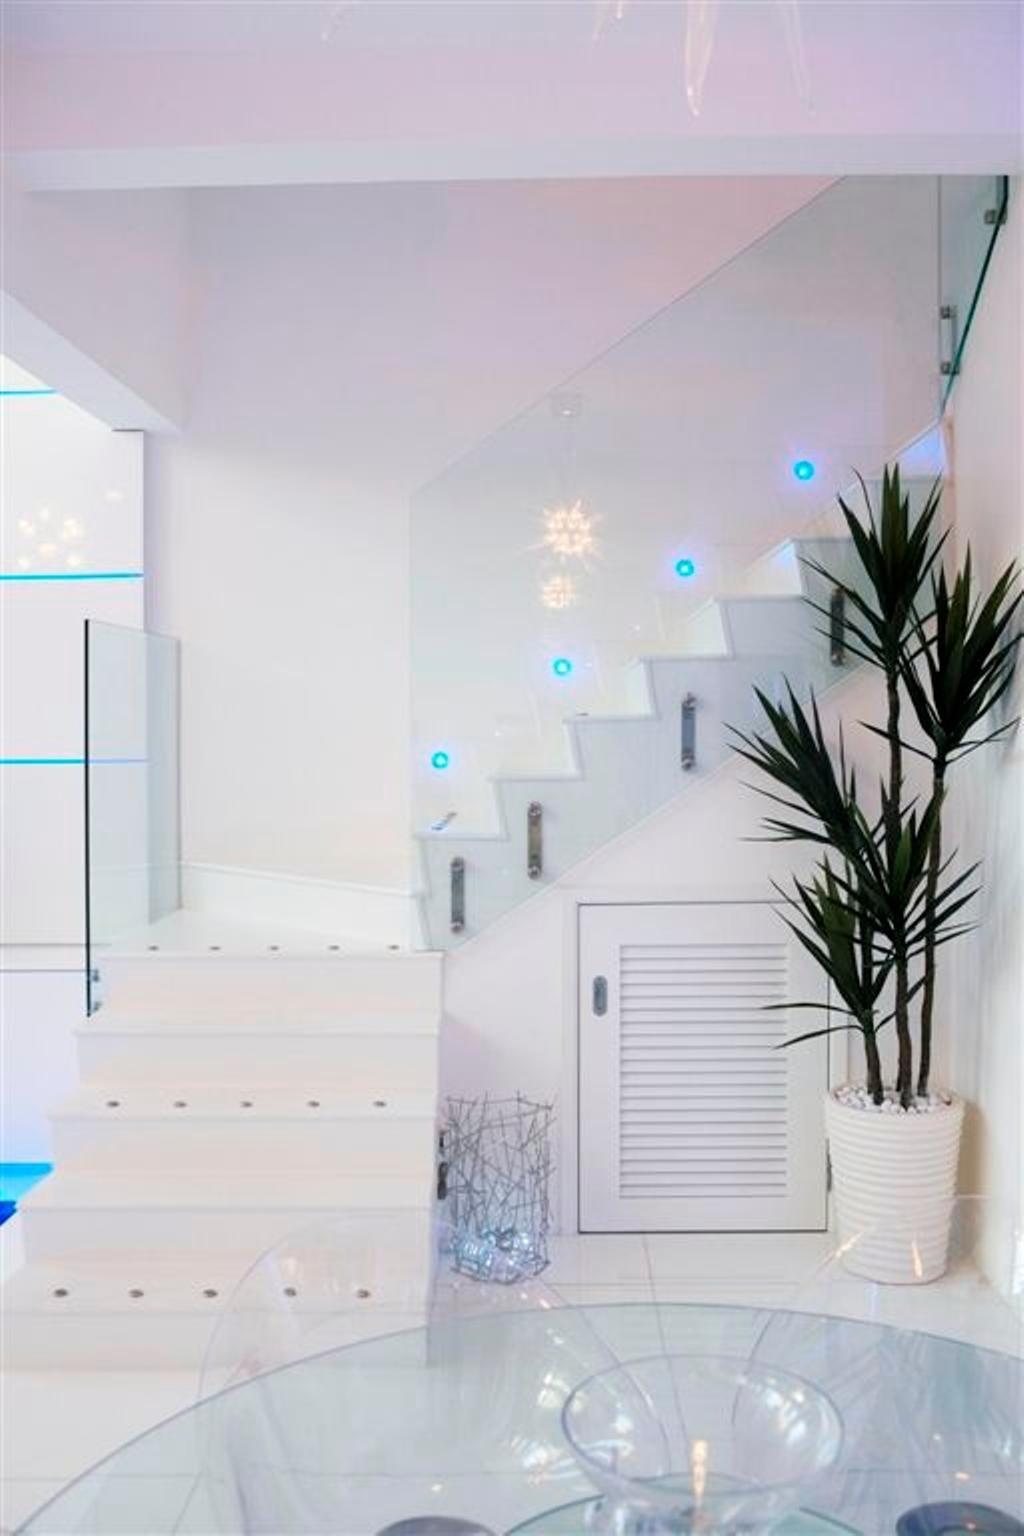 Transitional, Landed, Living Room, Sembawang, Interior Designer, Free Space Intent, Siding, Flora, Jar, Plant, Potted Plant, Pottery, Vase